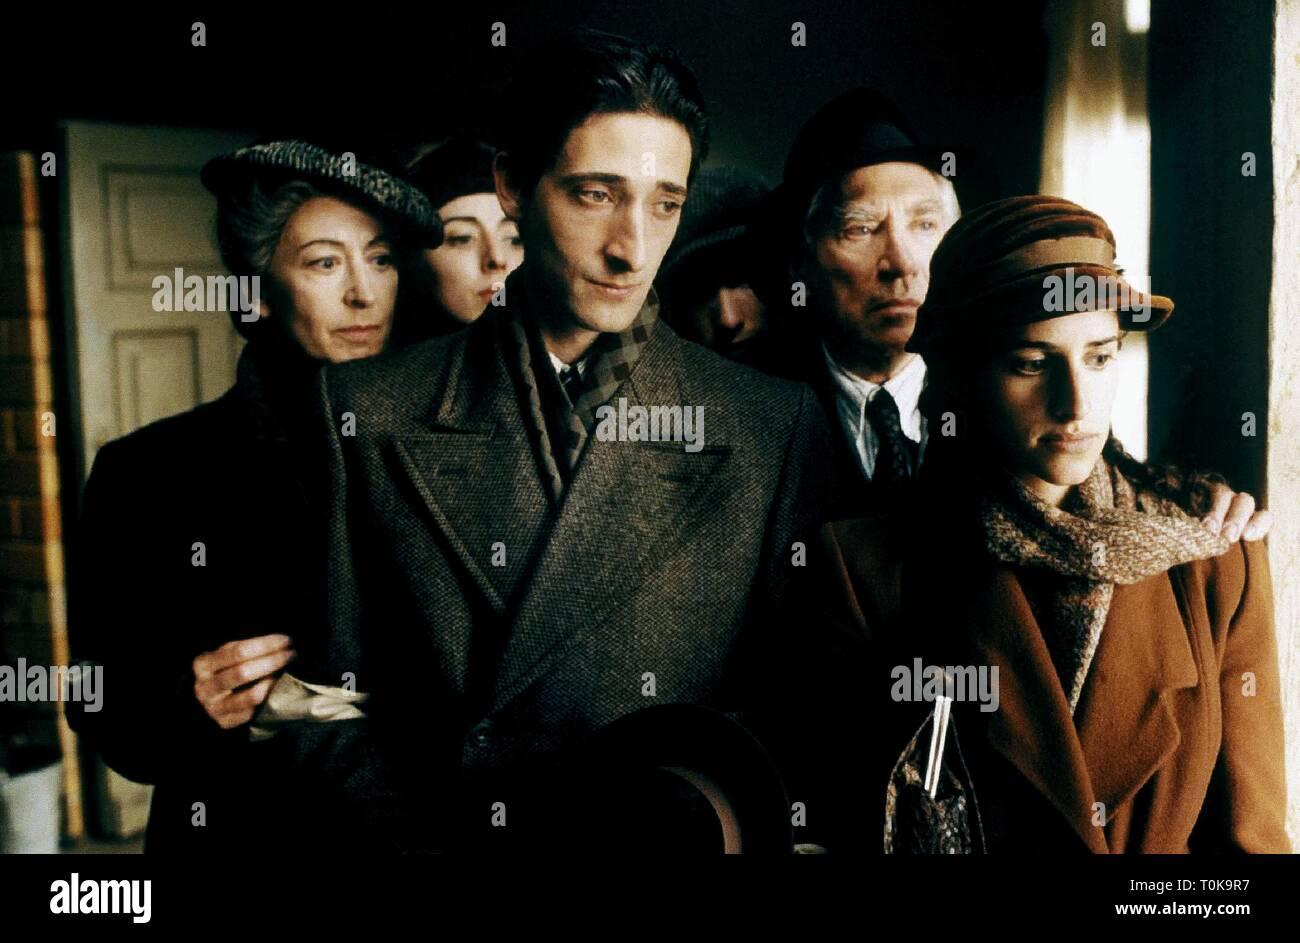 THE PIANIST, MAUREEN LIPMAN, JULIA RAYNER, ADRIEN BRODY, ED STOPPARD, FRANK FINLAY , JESSICA KATE MEYER, 2002 Stock Photo